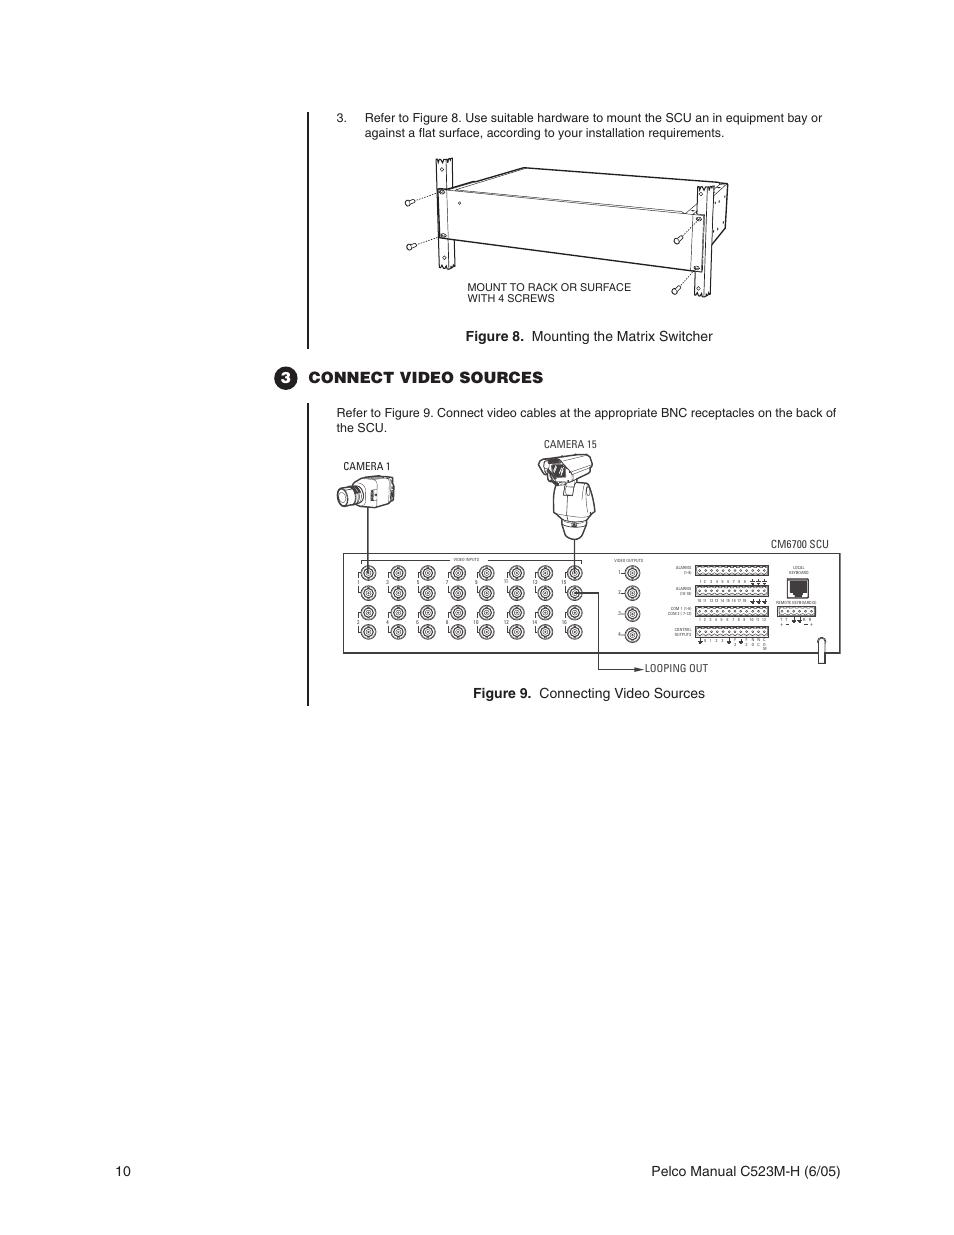 3connect video sources figure 8 mounting the matrix switcher rh manualsdir com pelco cm6700-mxb manual